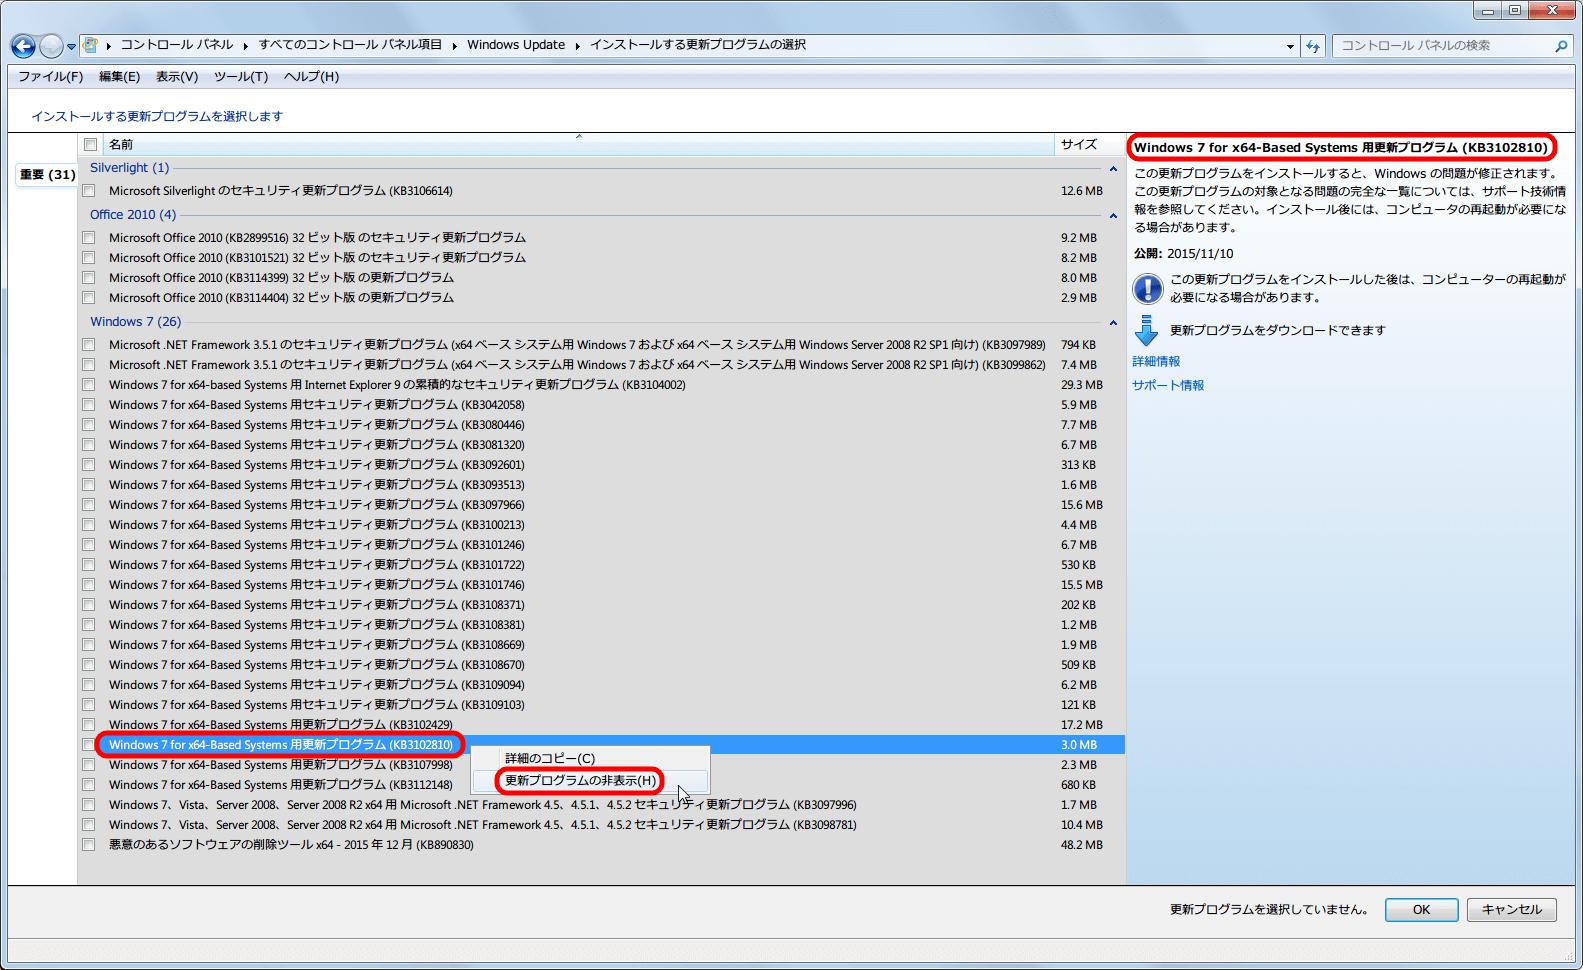 Windows Update 2015年12月分 KB3112343 と KB3035583 非表示後に表示された Windows Update 2015年11月分 KB3102810 更新プログラムの非表示